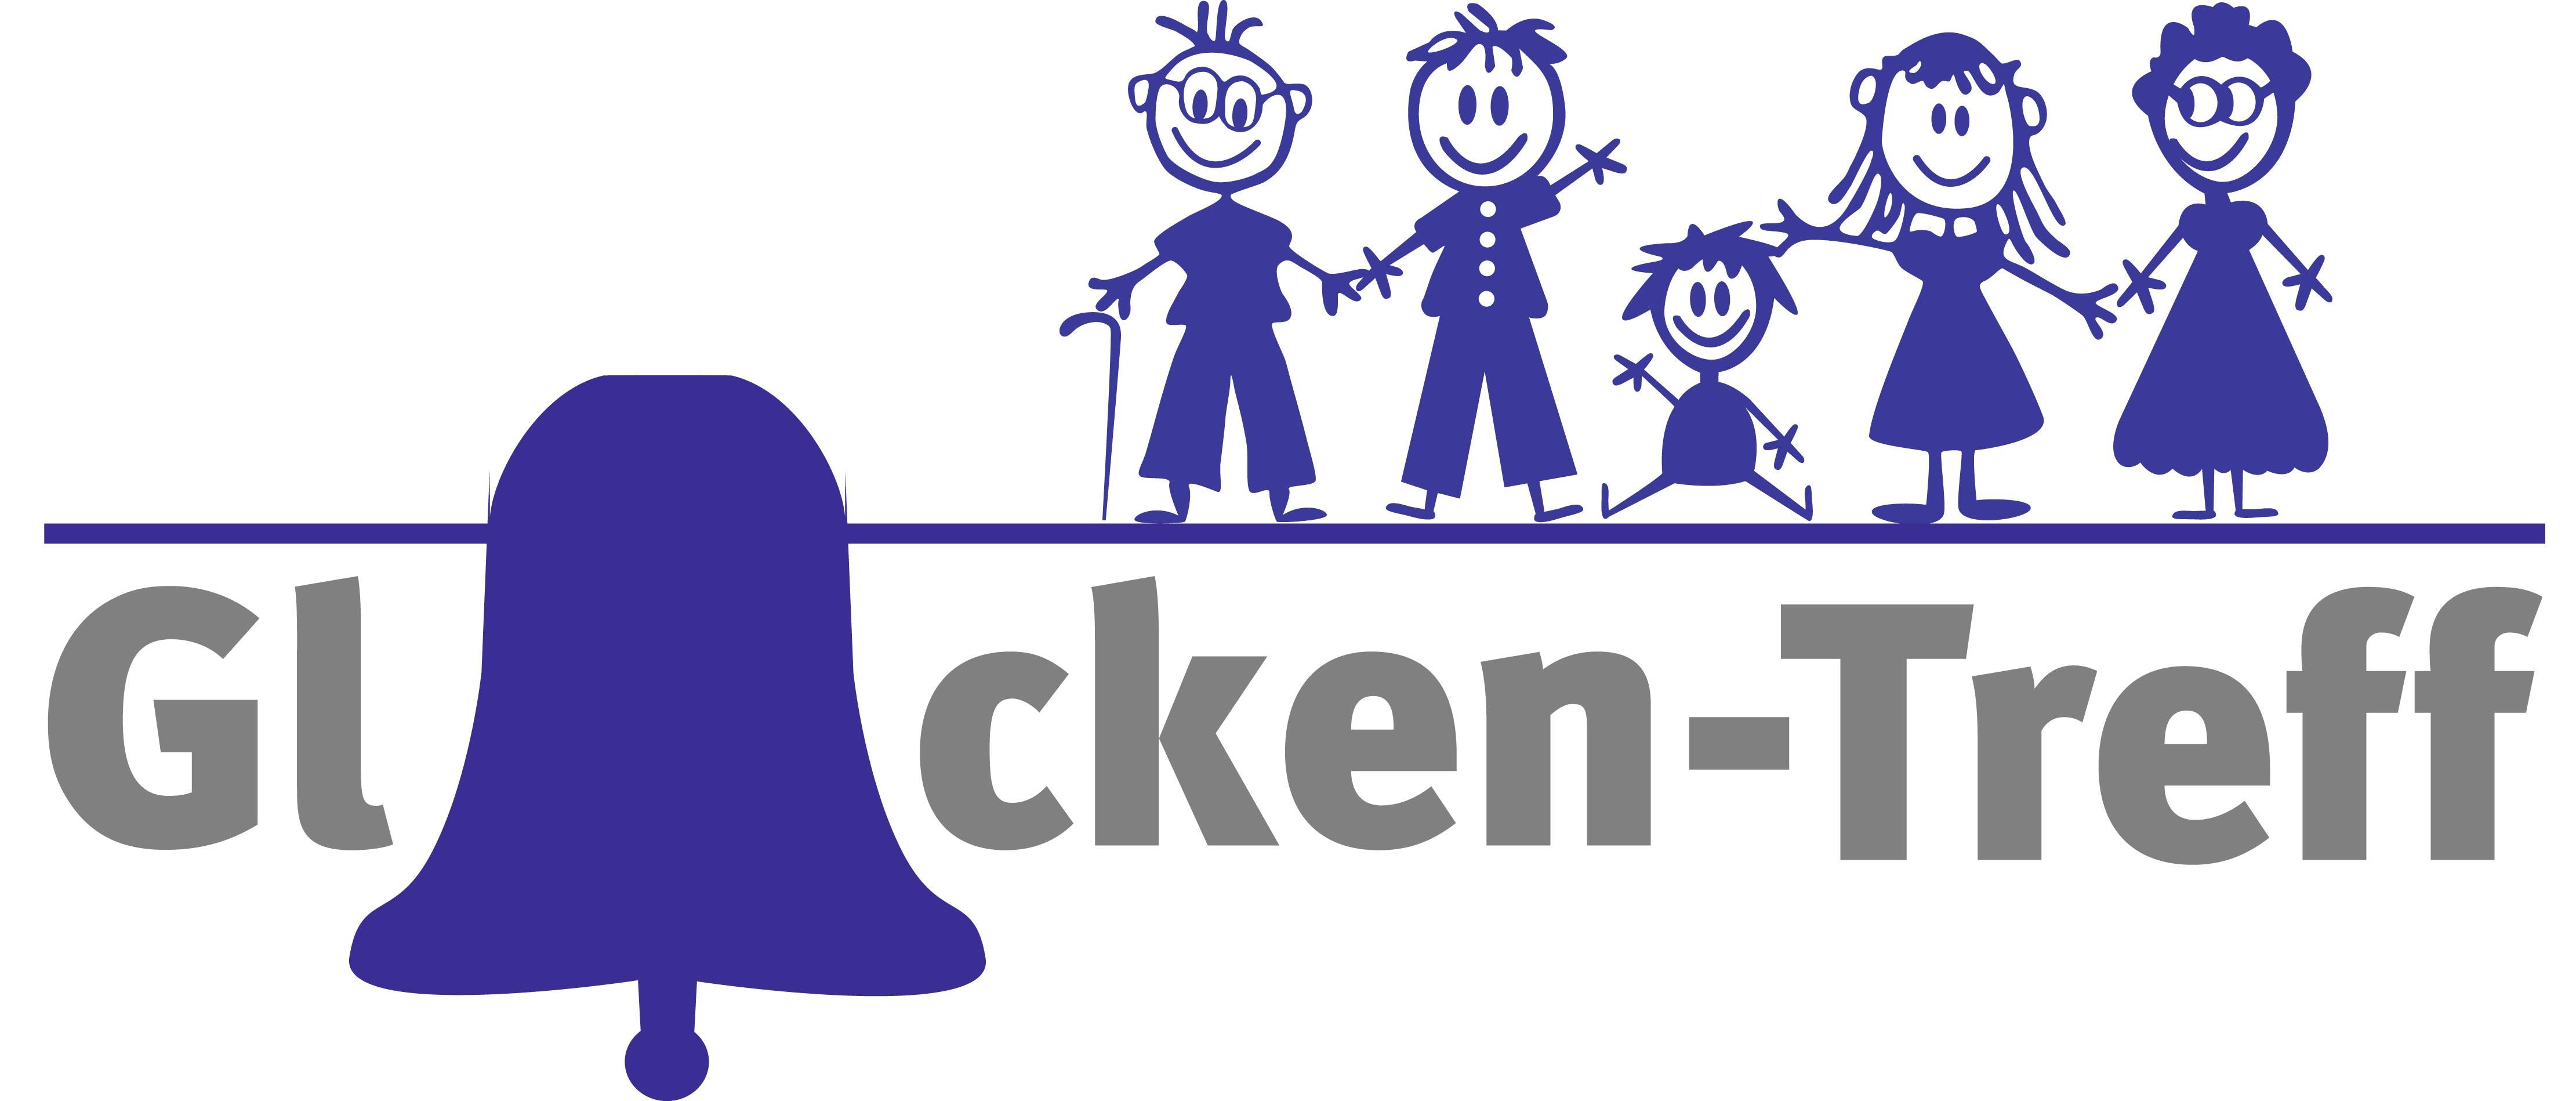 Glockentreff_Logo.jpg.